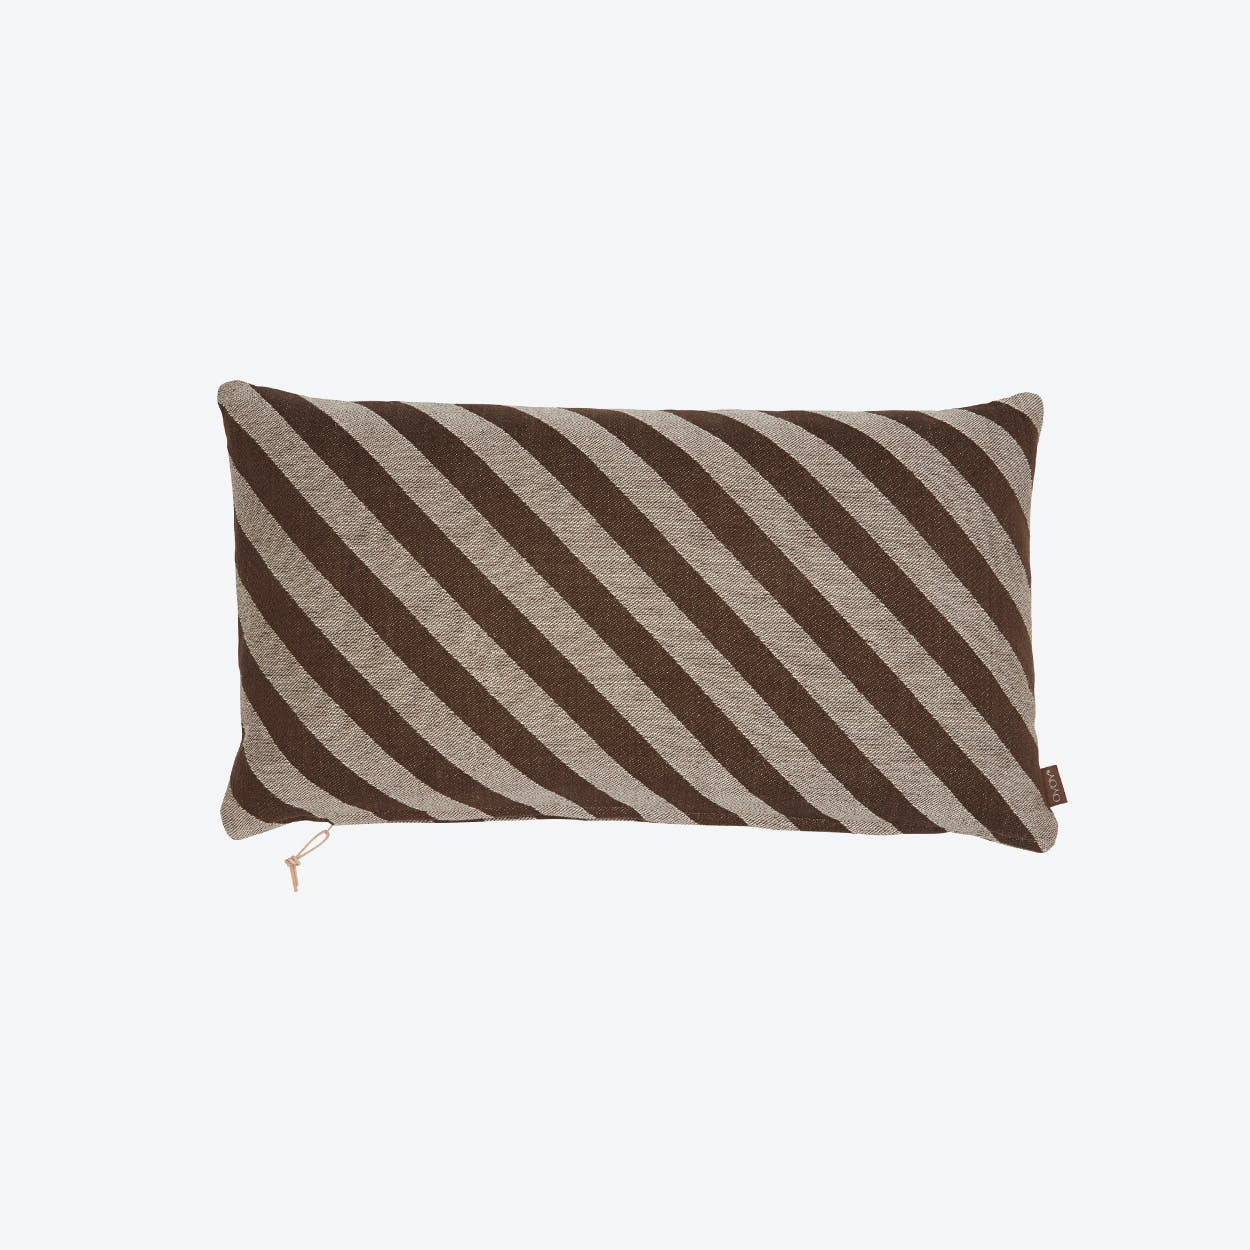 Fluffy Cushion in Brown